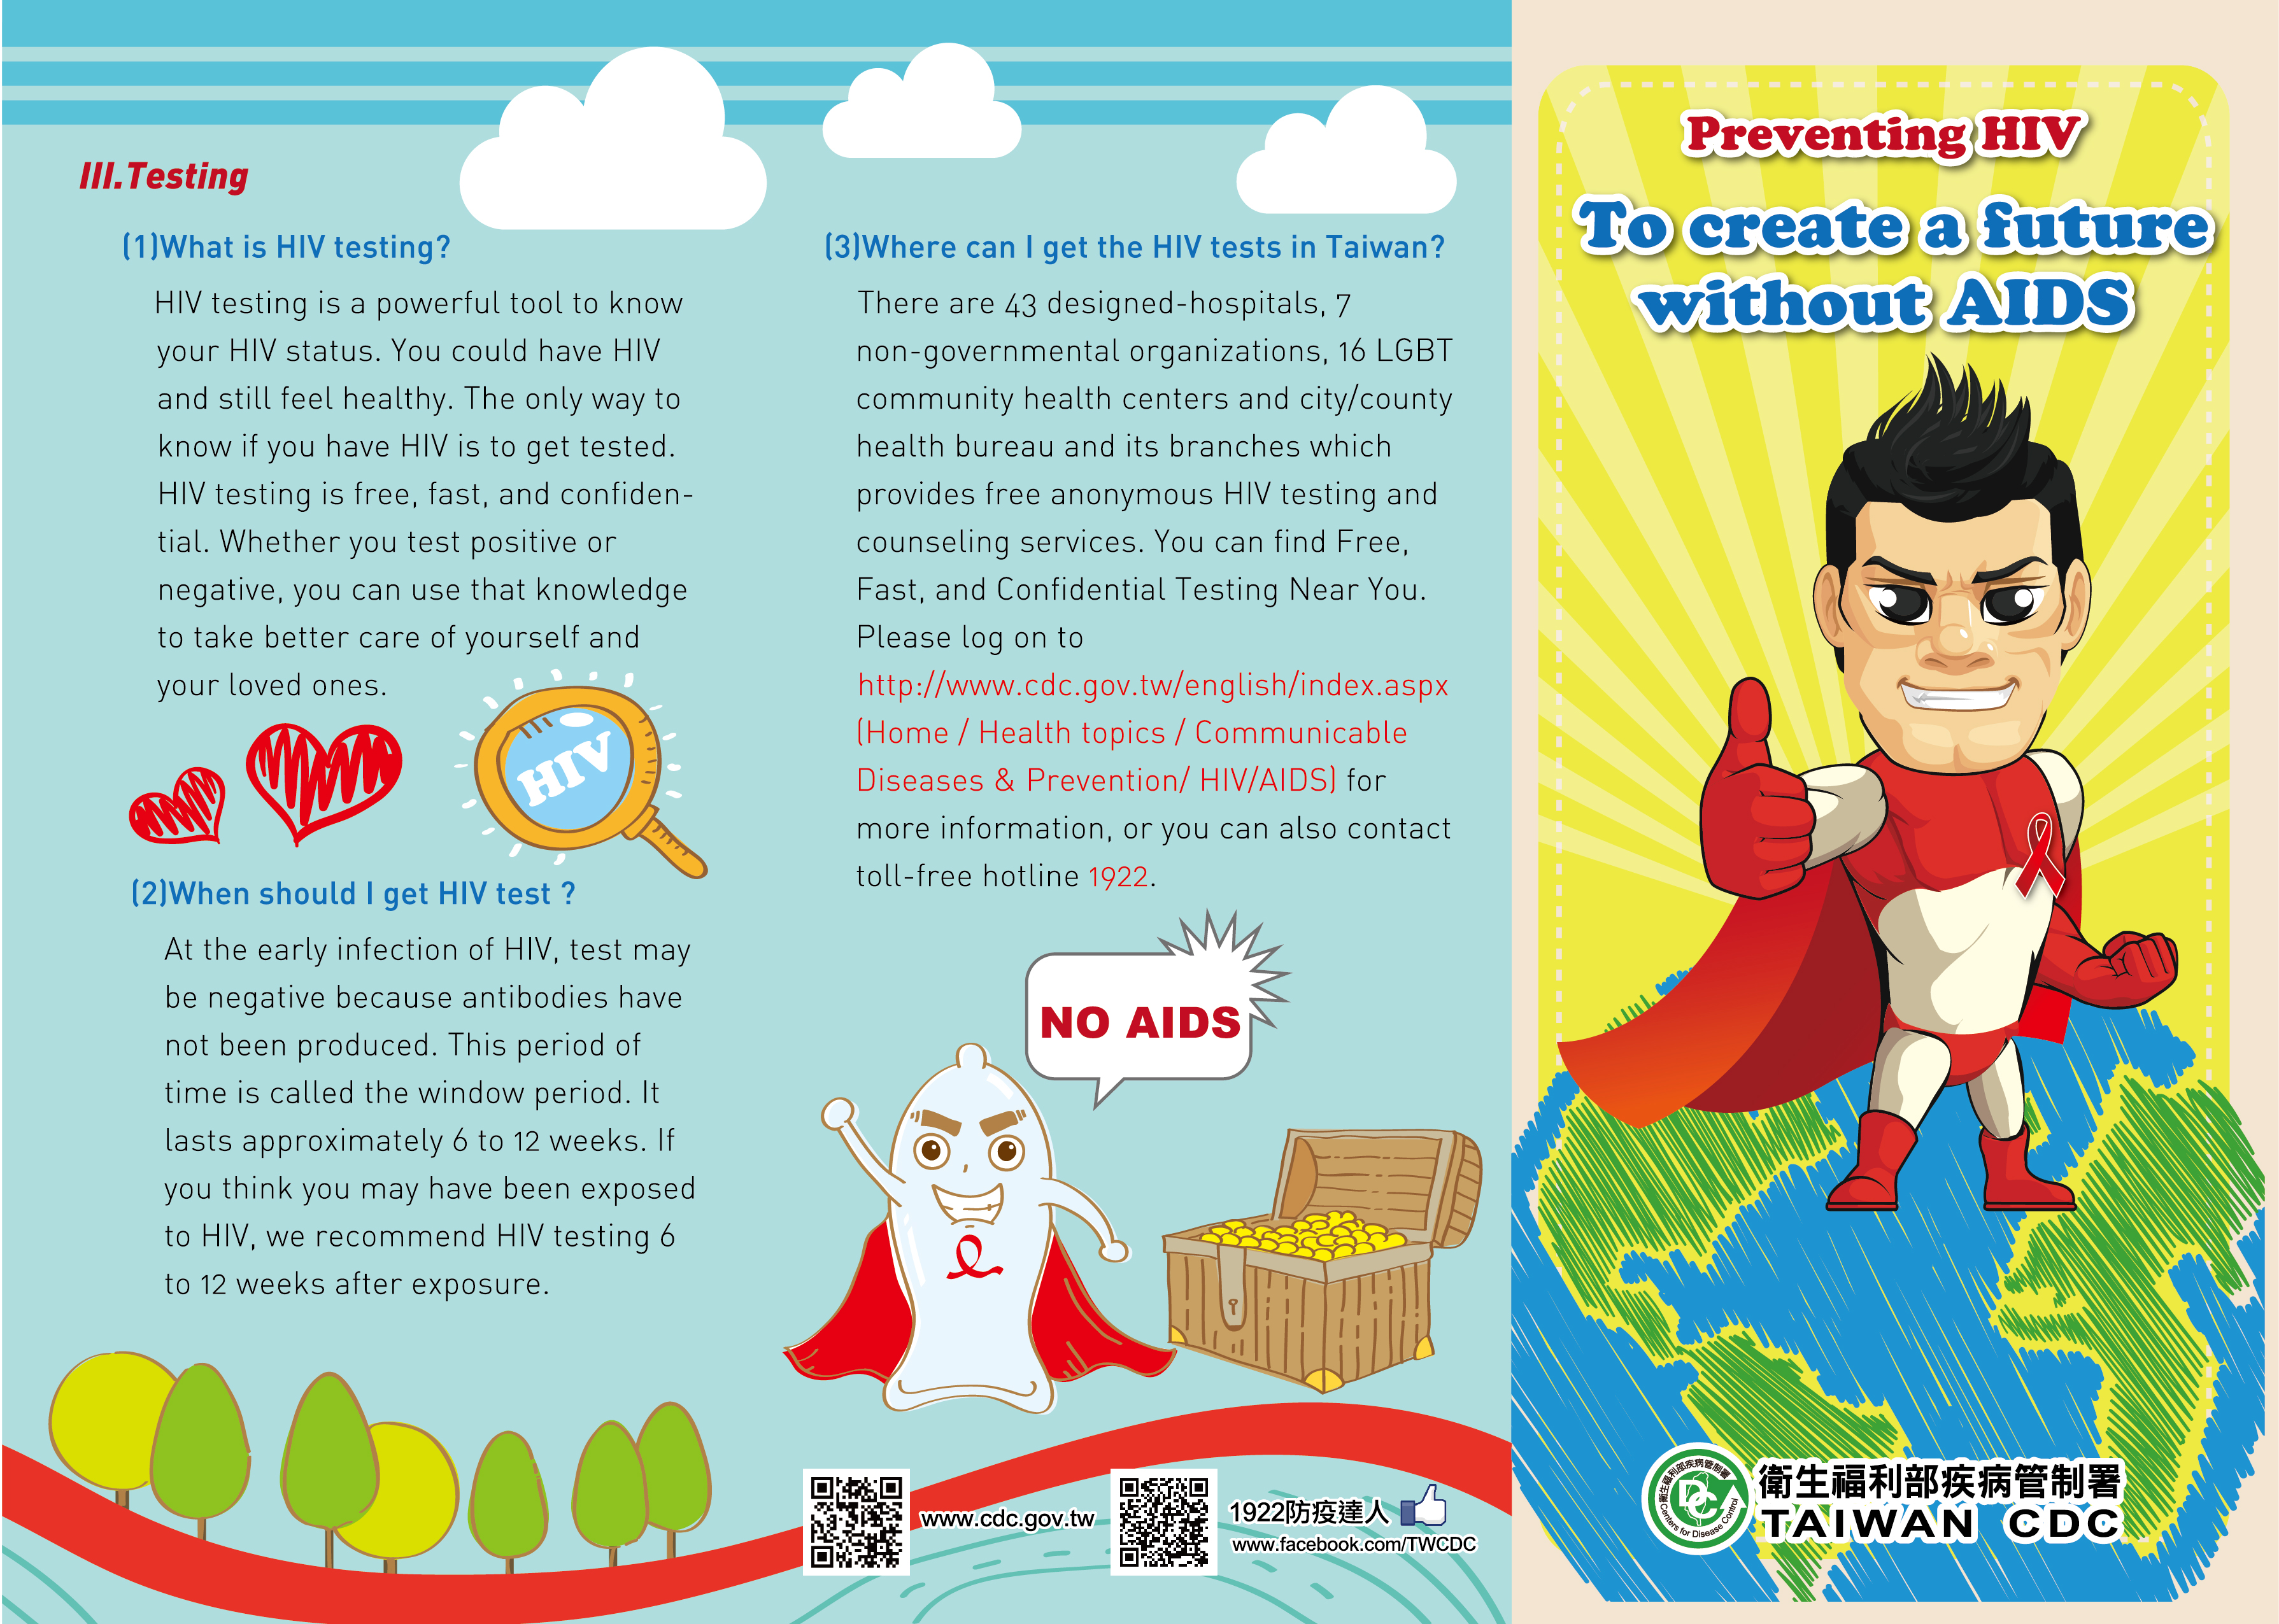 詳如附件【click me】HIV AIDS prevention(Page 1)HIV AIDS預防(英文)